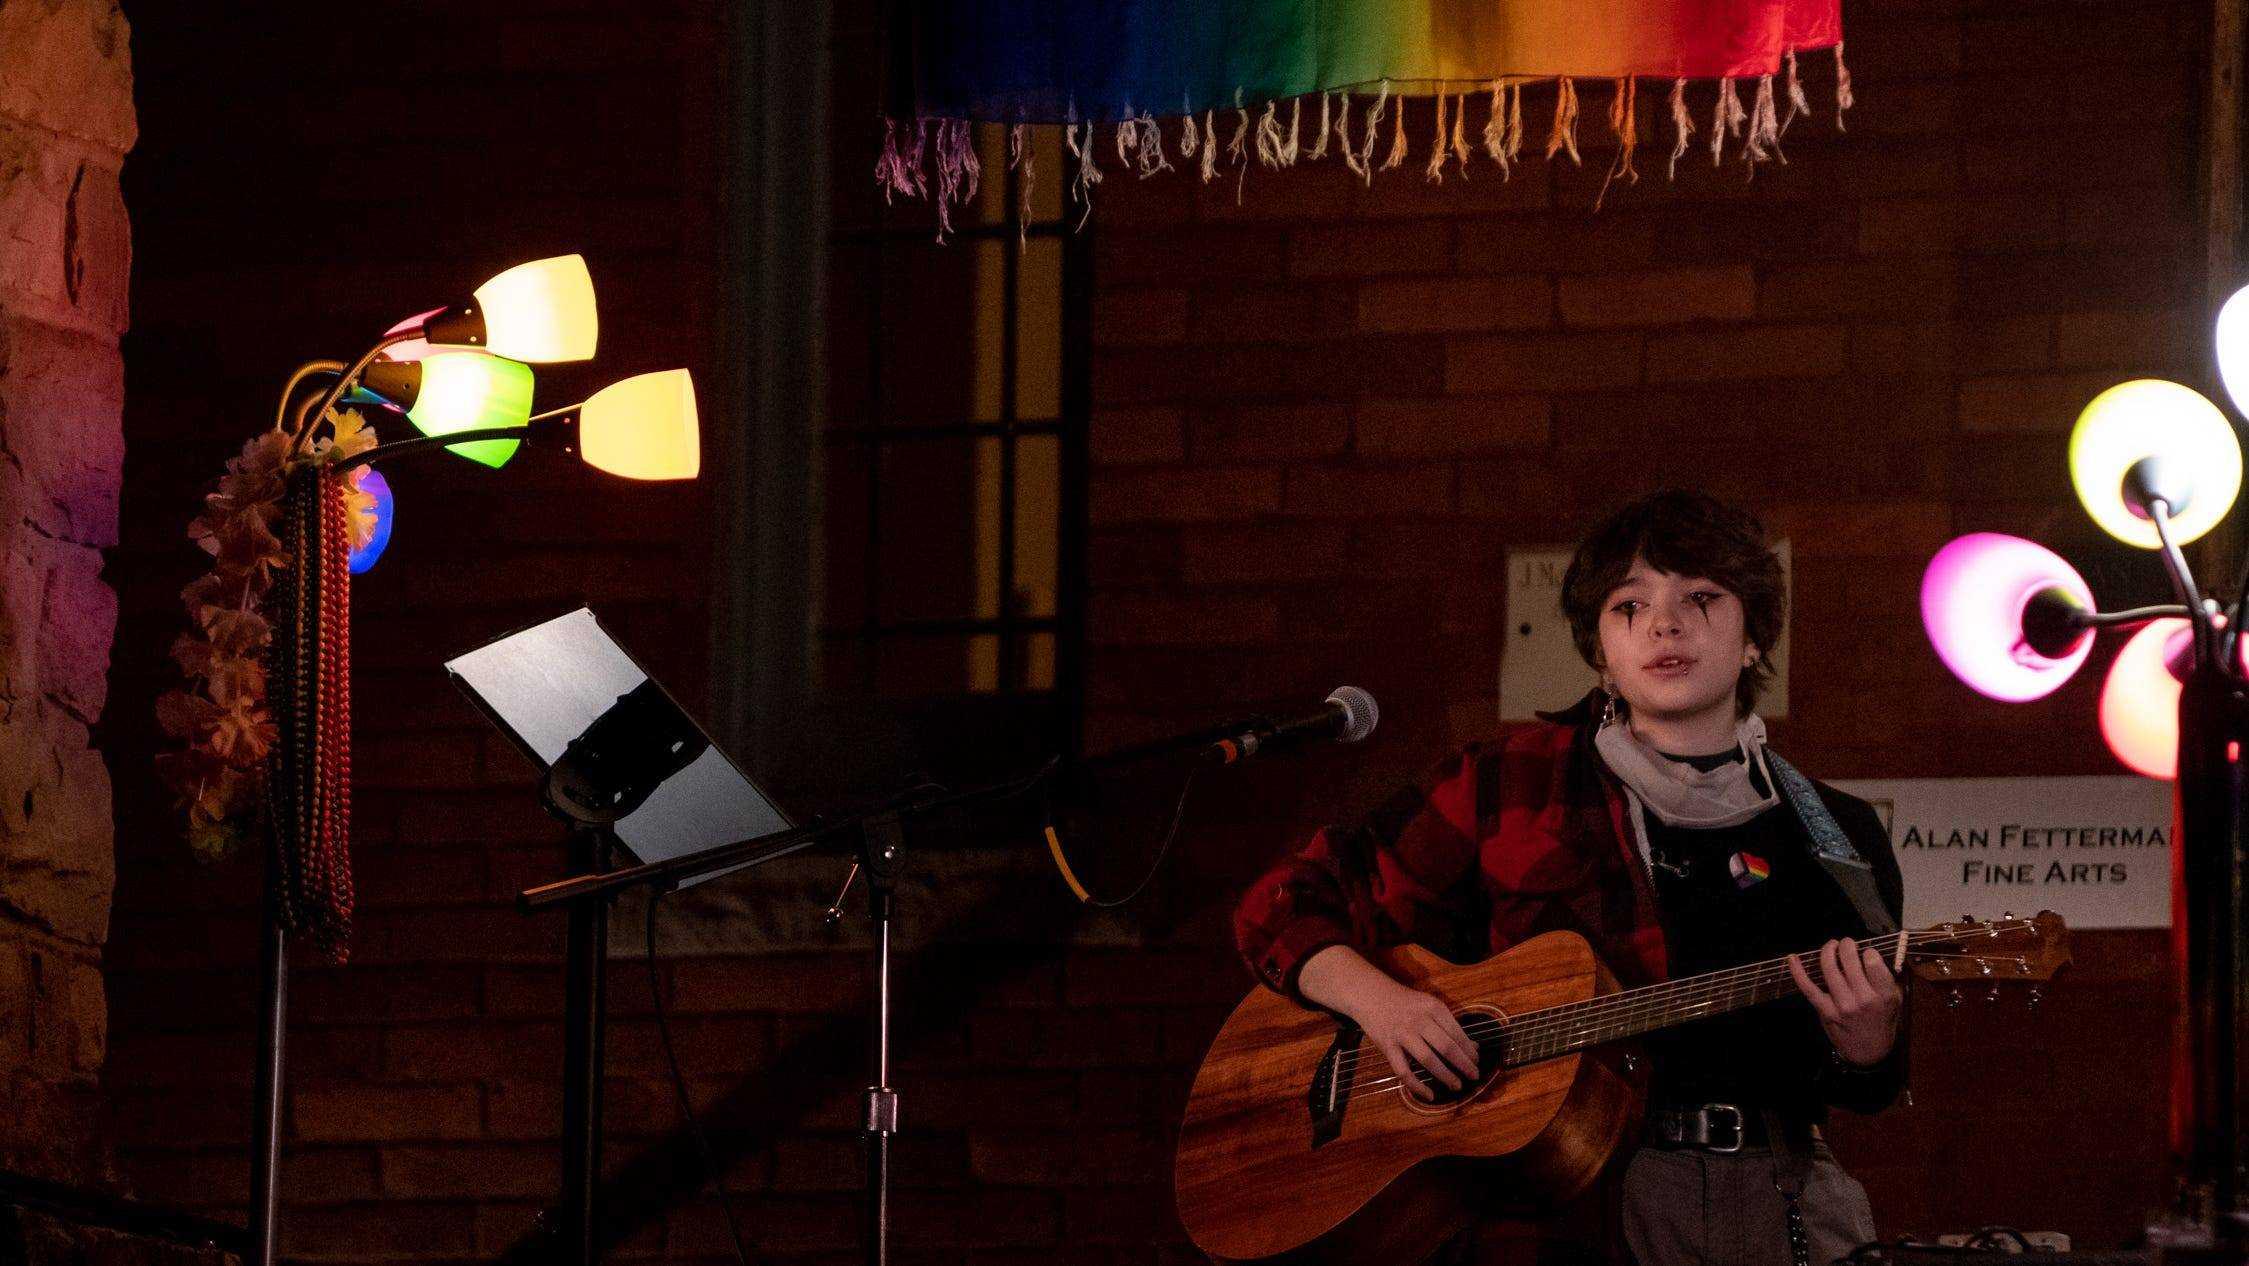 Rowan Hara, 16, from Lambertville, sings the song